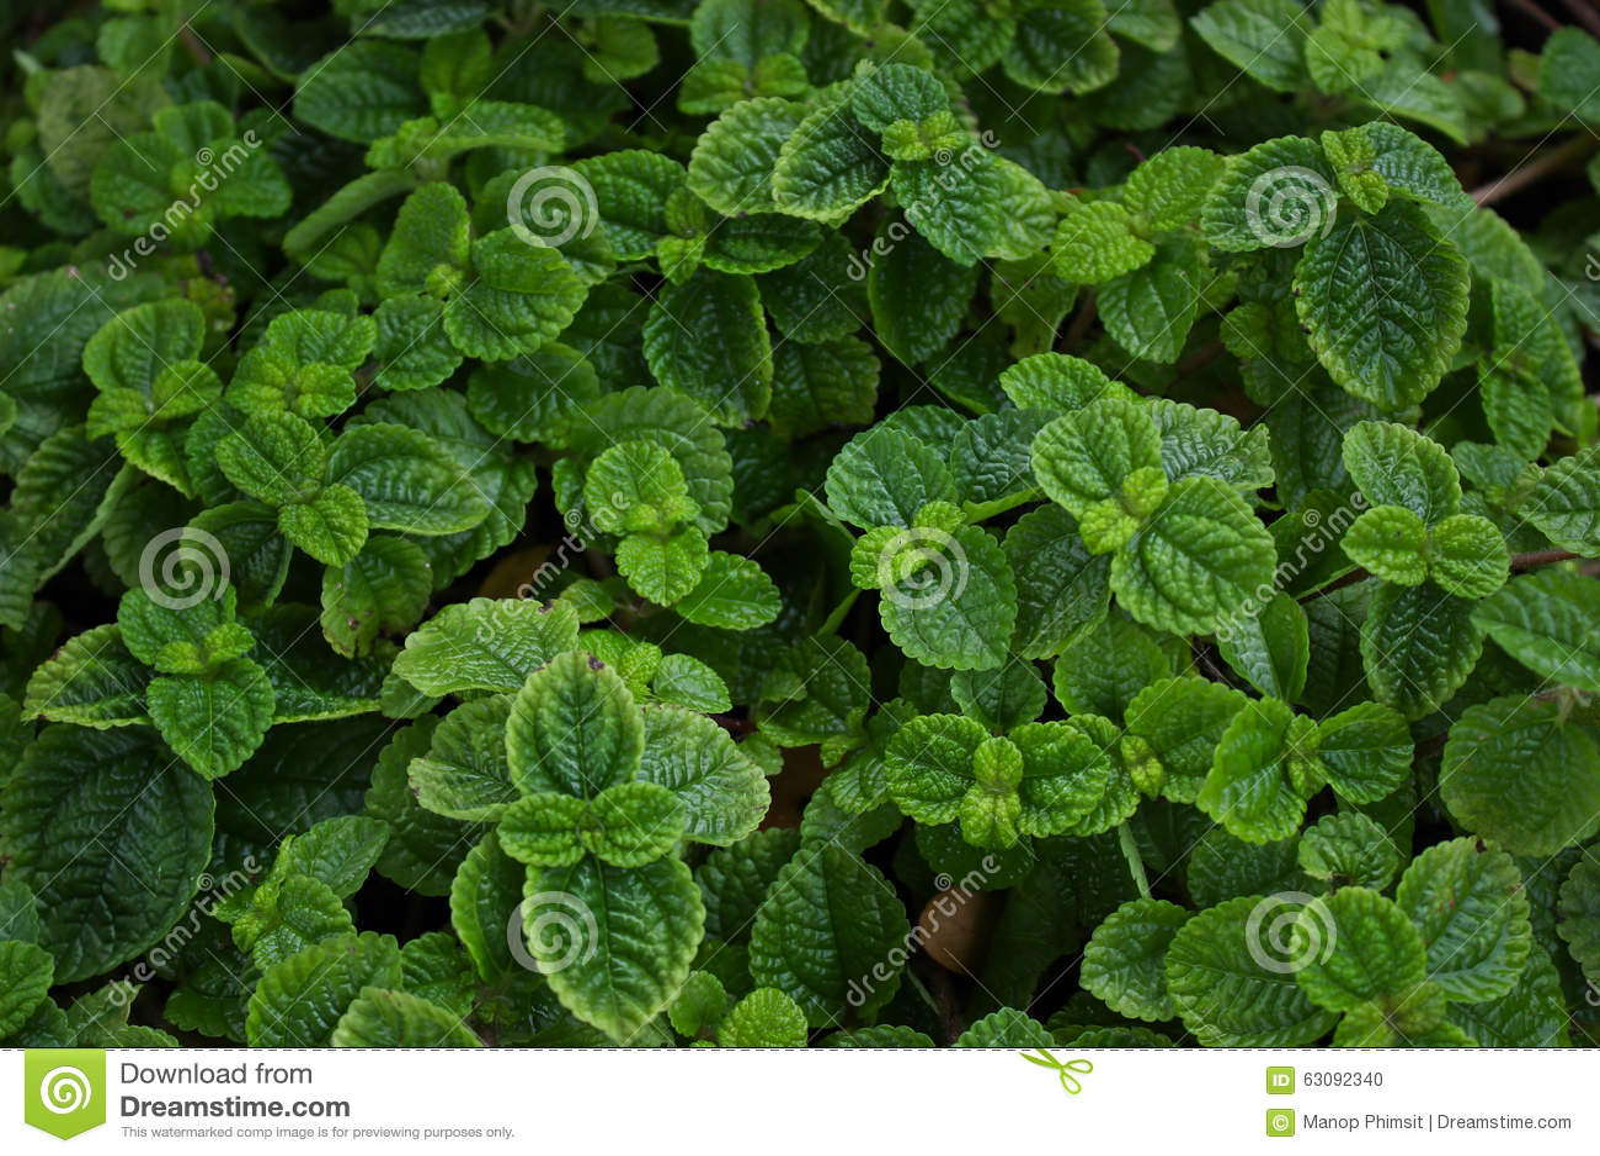 Download Monnayages photo stock. Image du nourriture, herbal, frais - 63092340